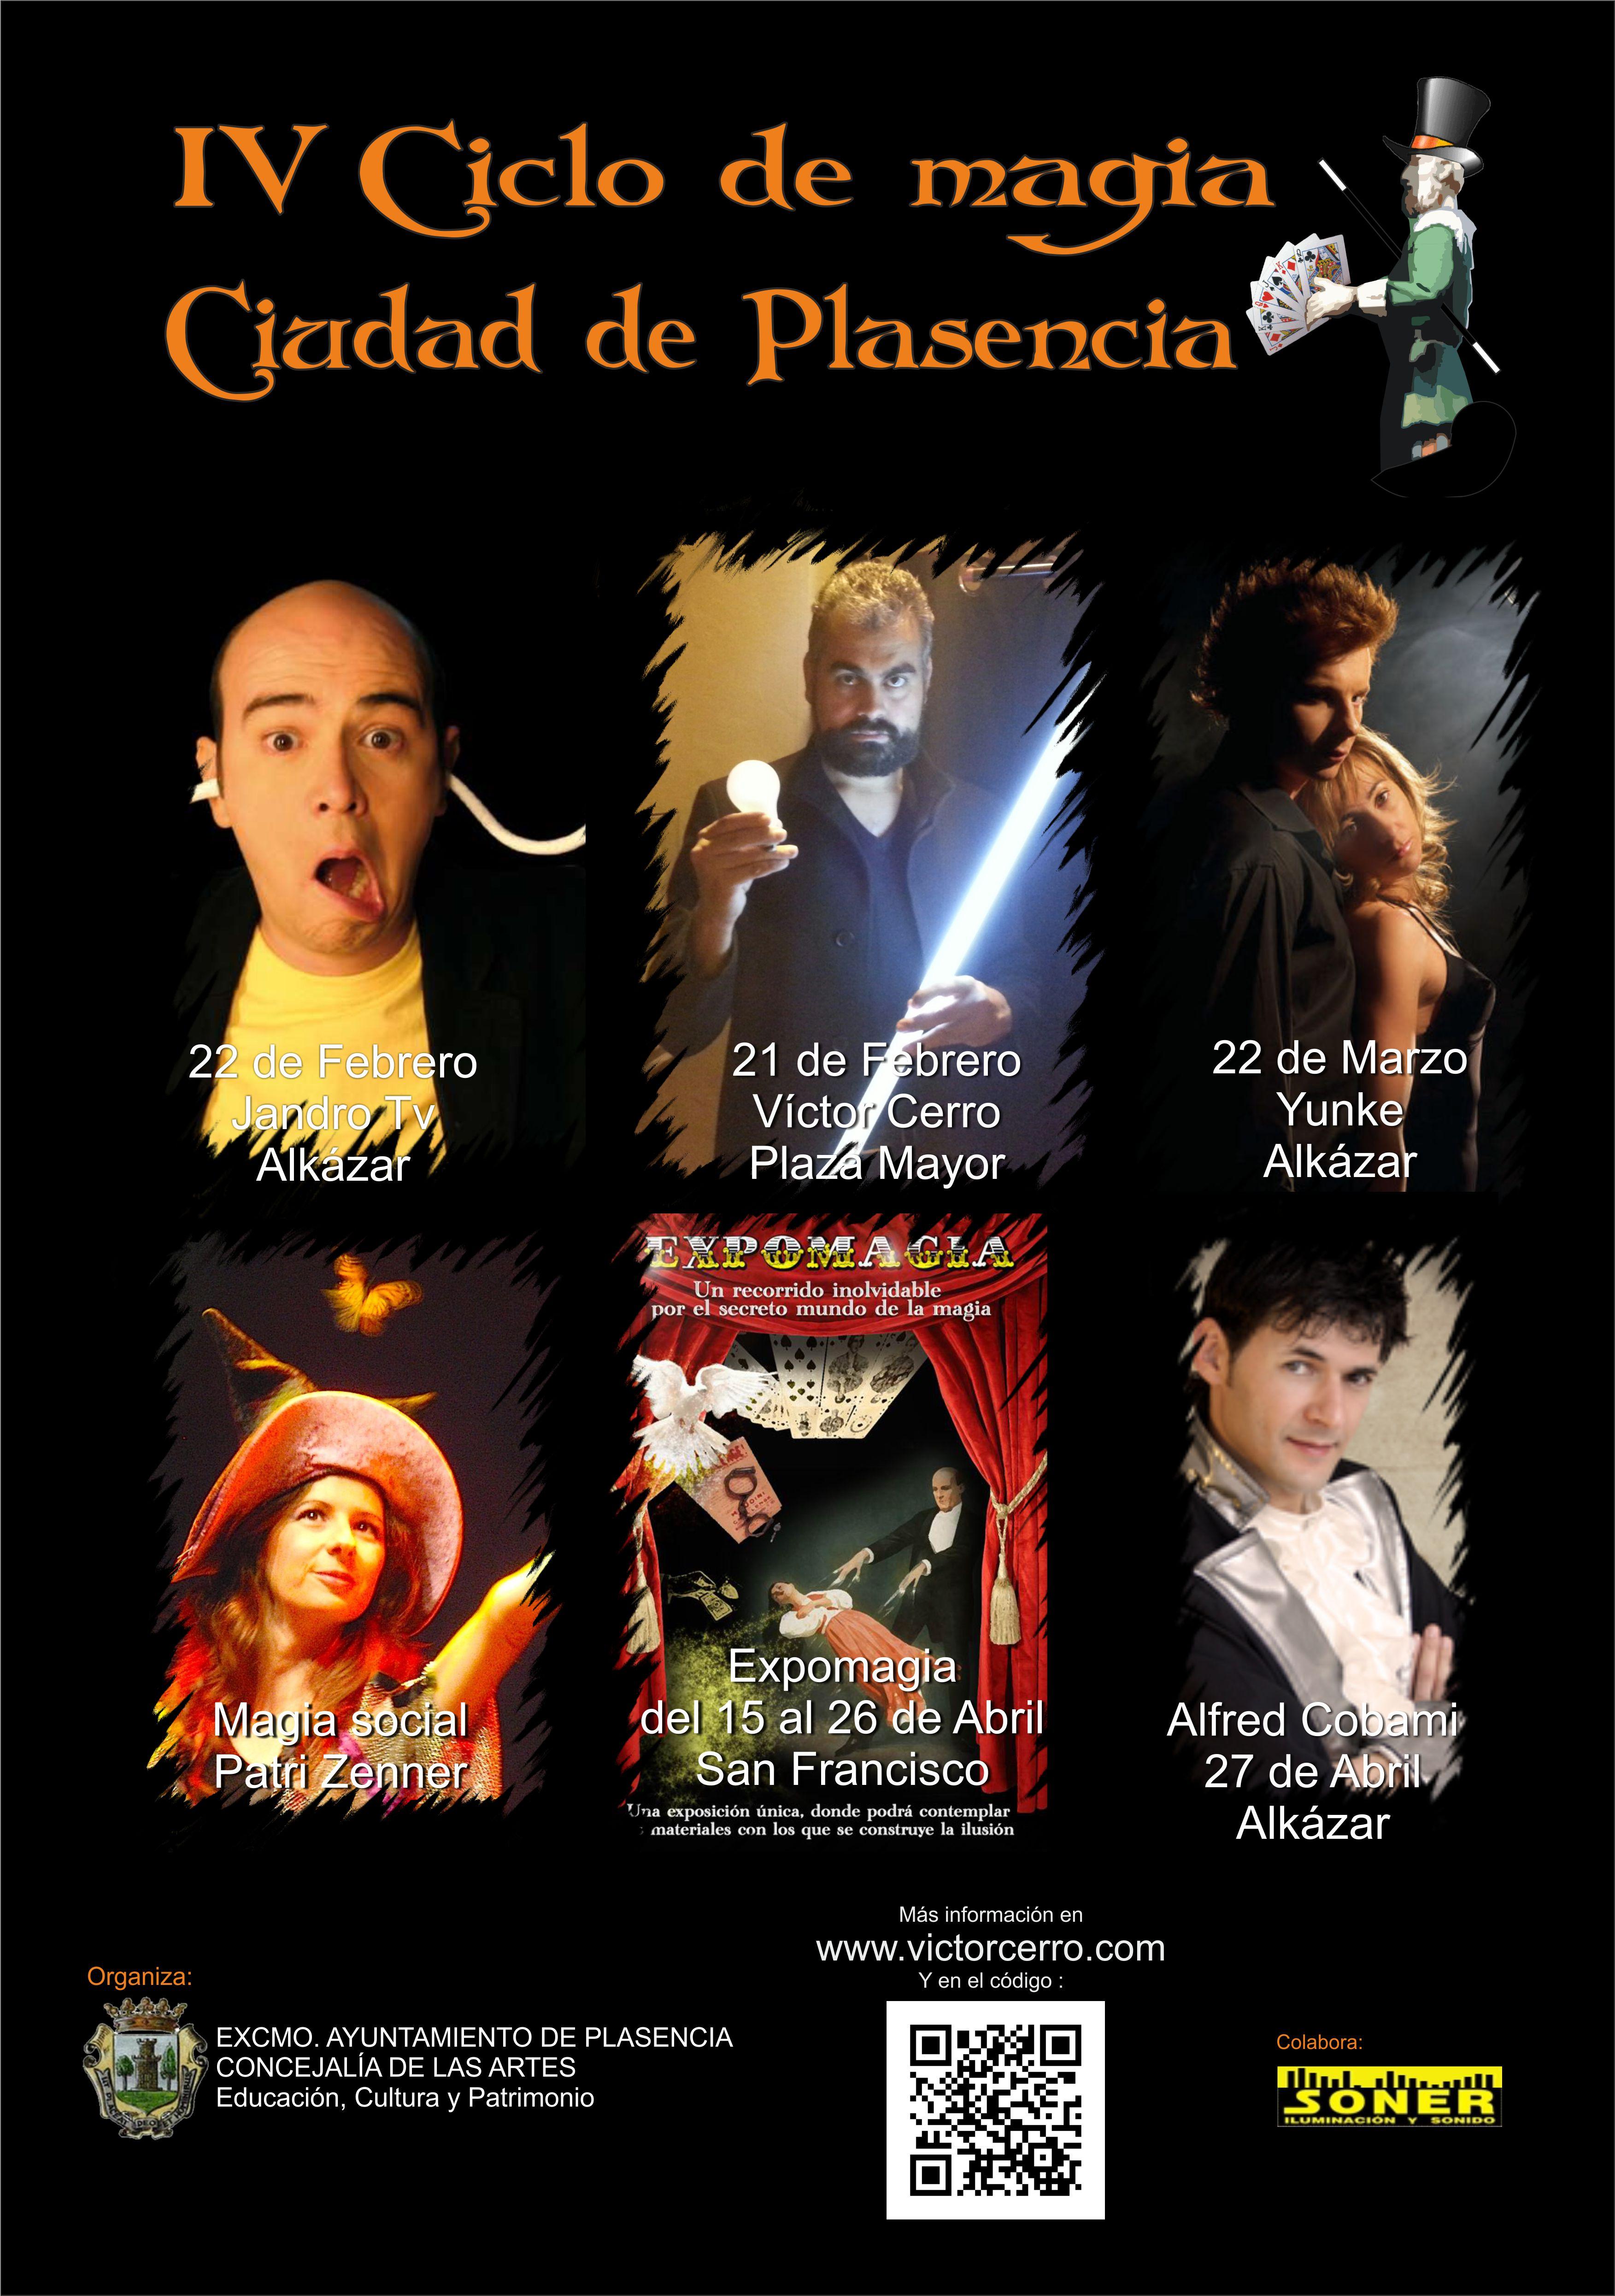 Ciclo magia 2013 Plasencia